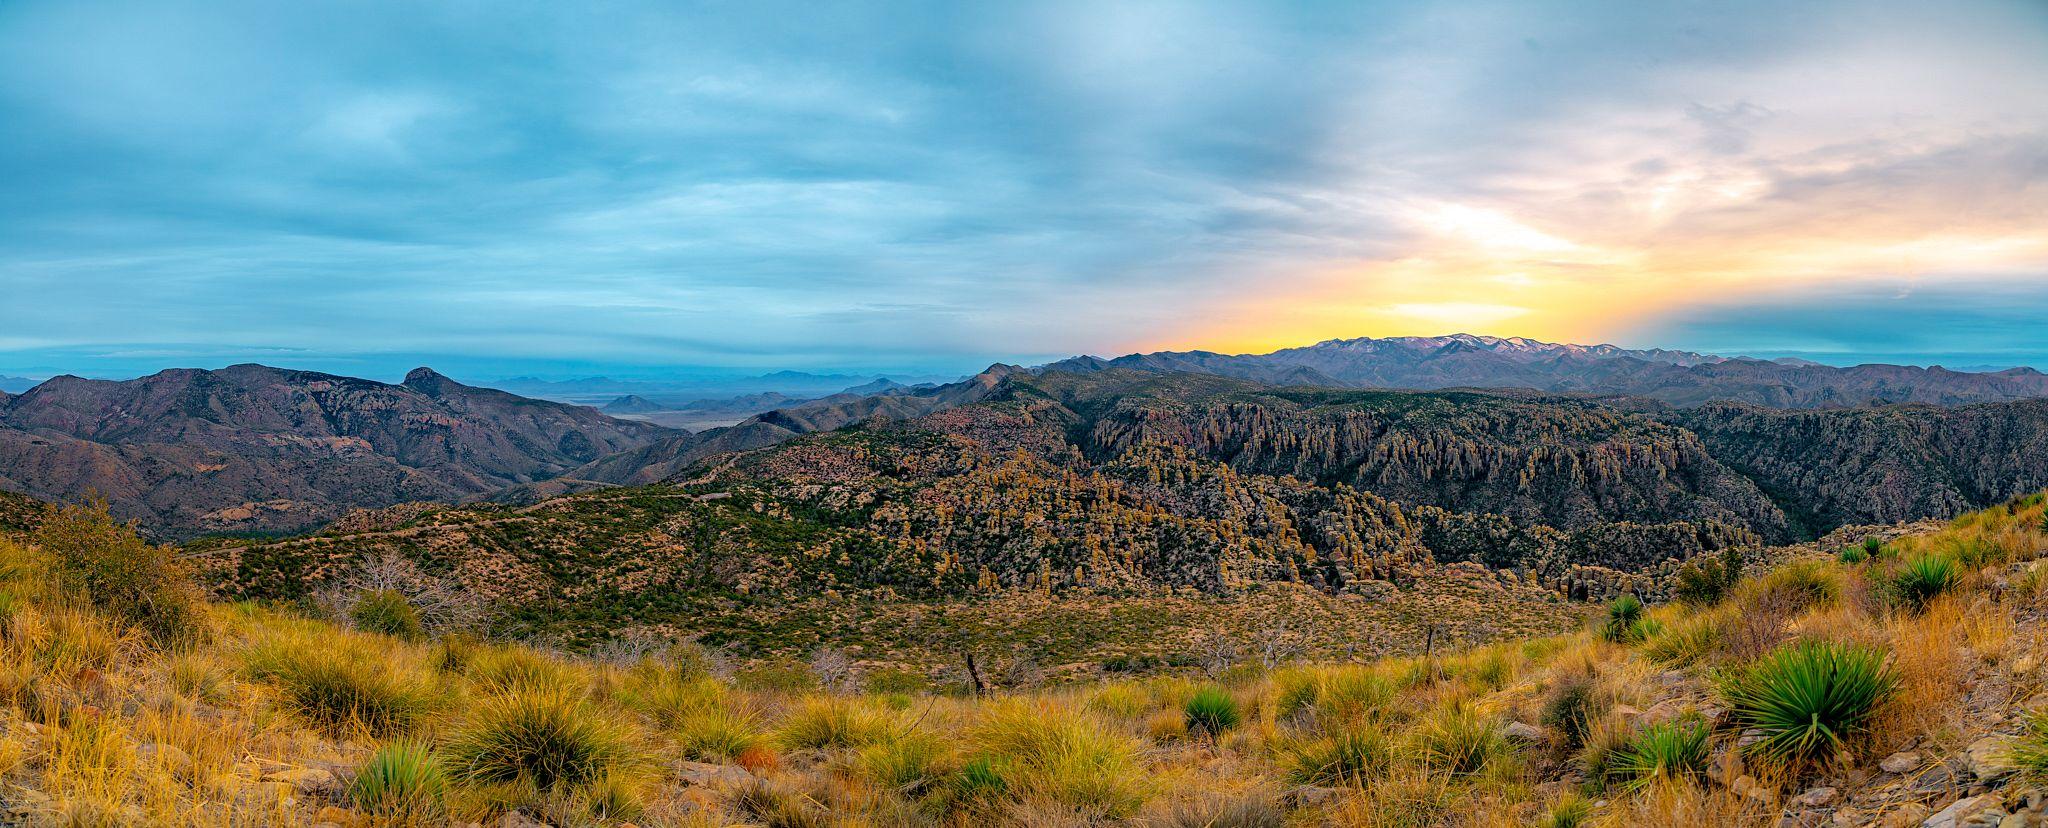 Sunset at Chiricahua National Monument